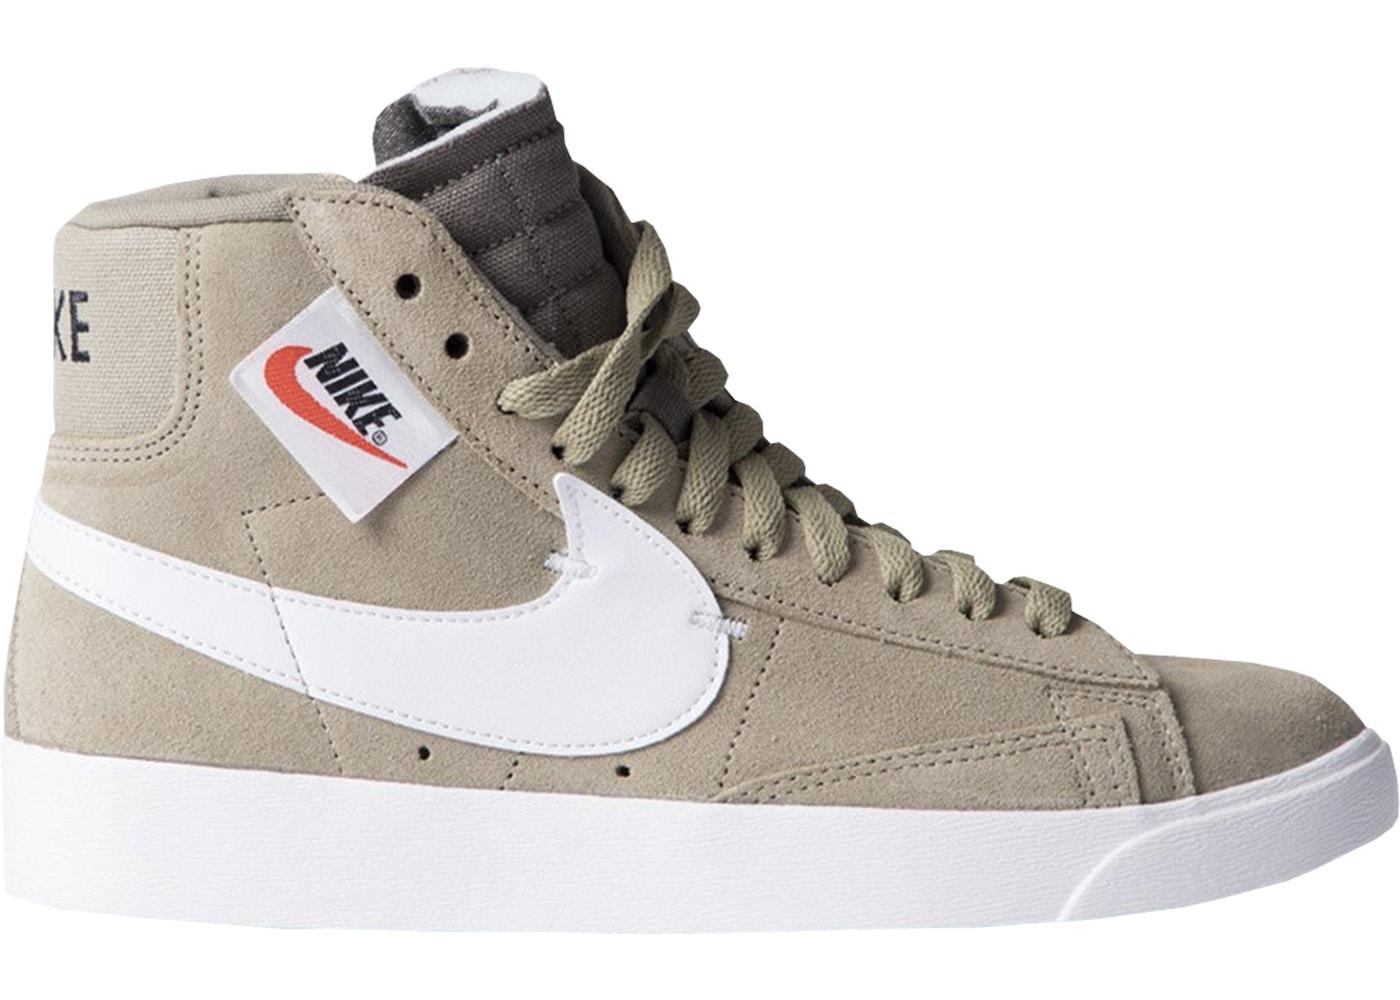 Nike Blazer Mid Rebel Neutral Olive (W) - BQ4022-201